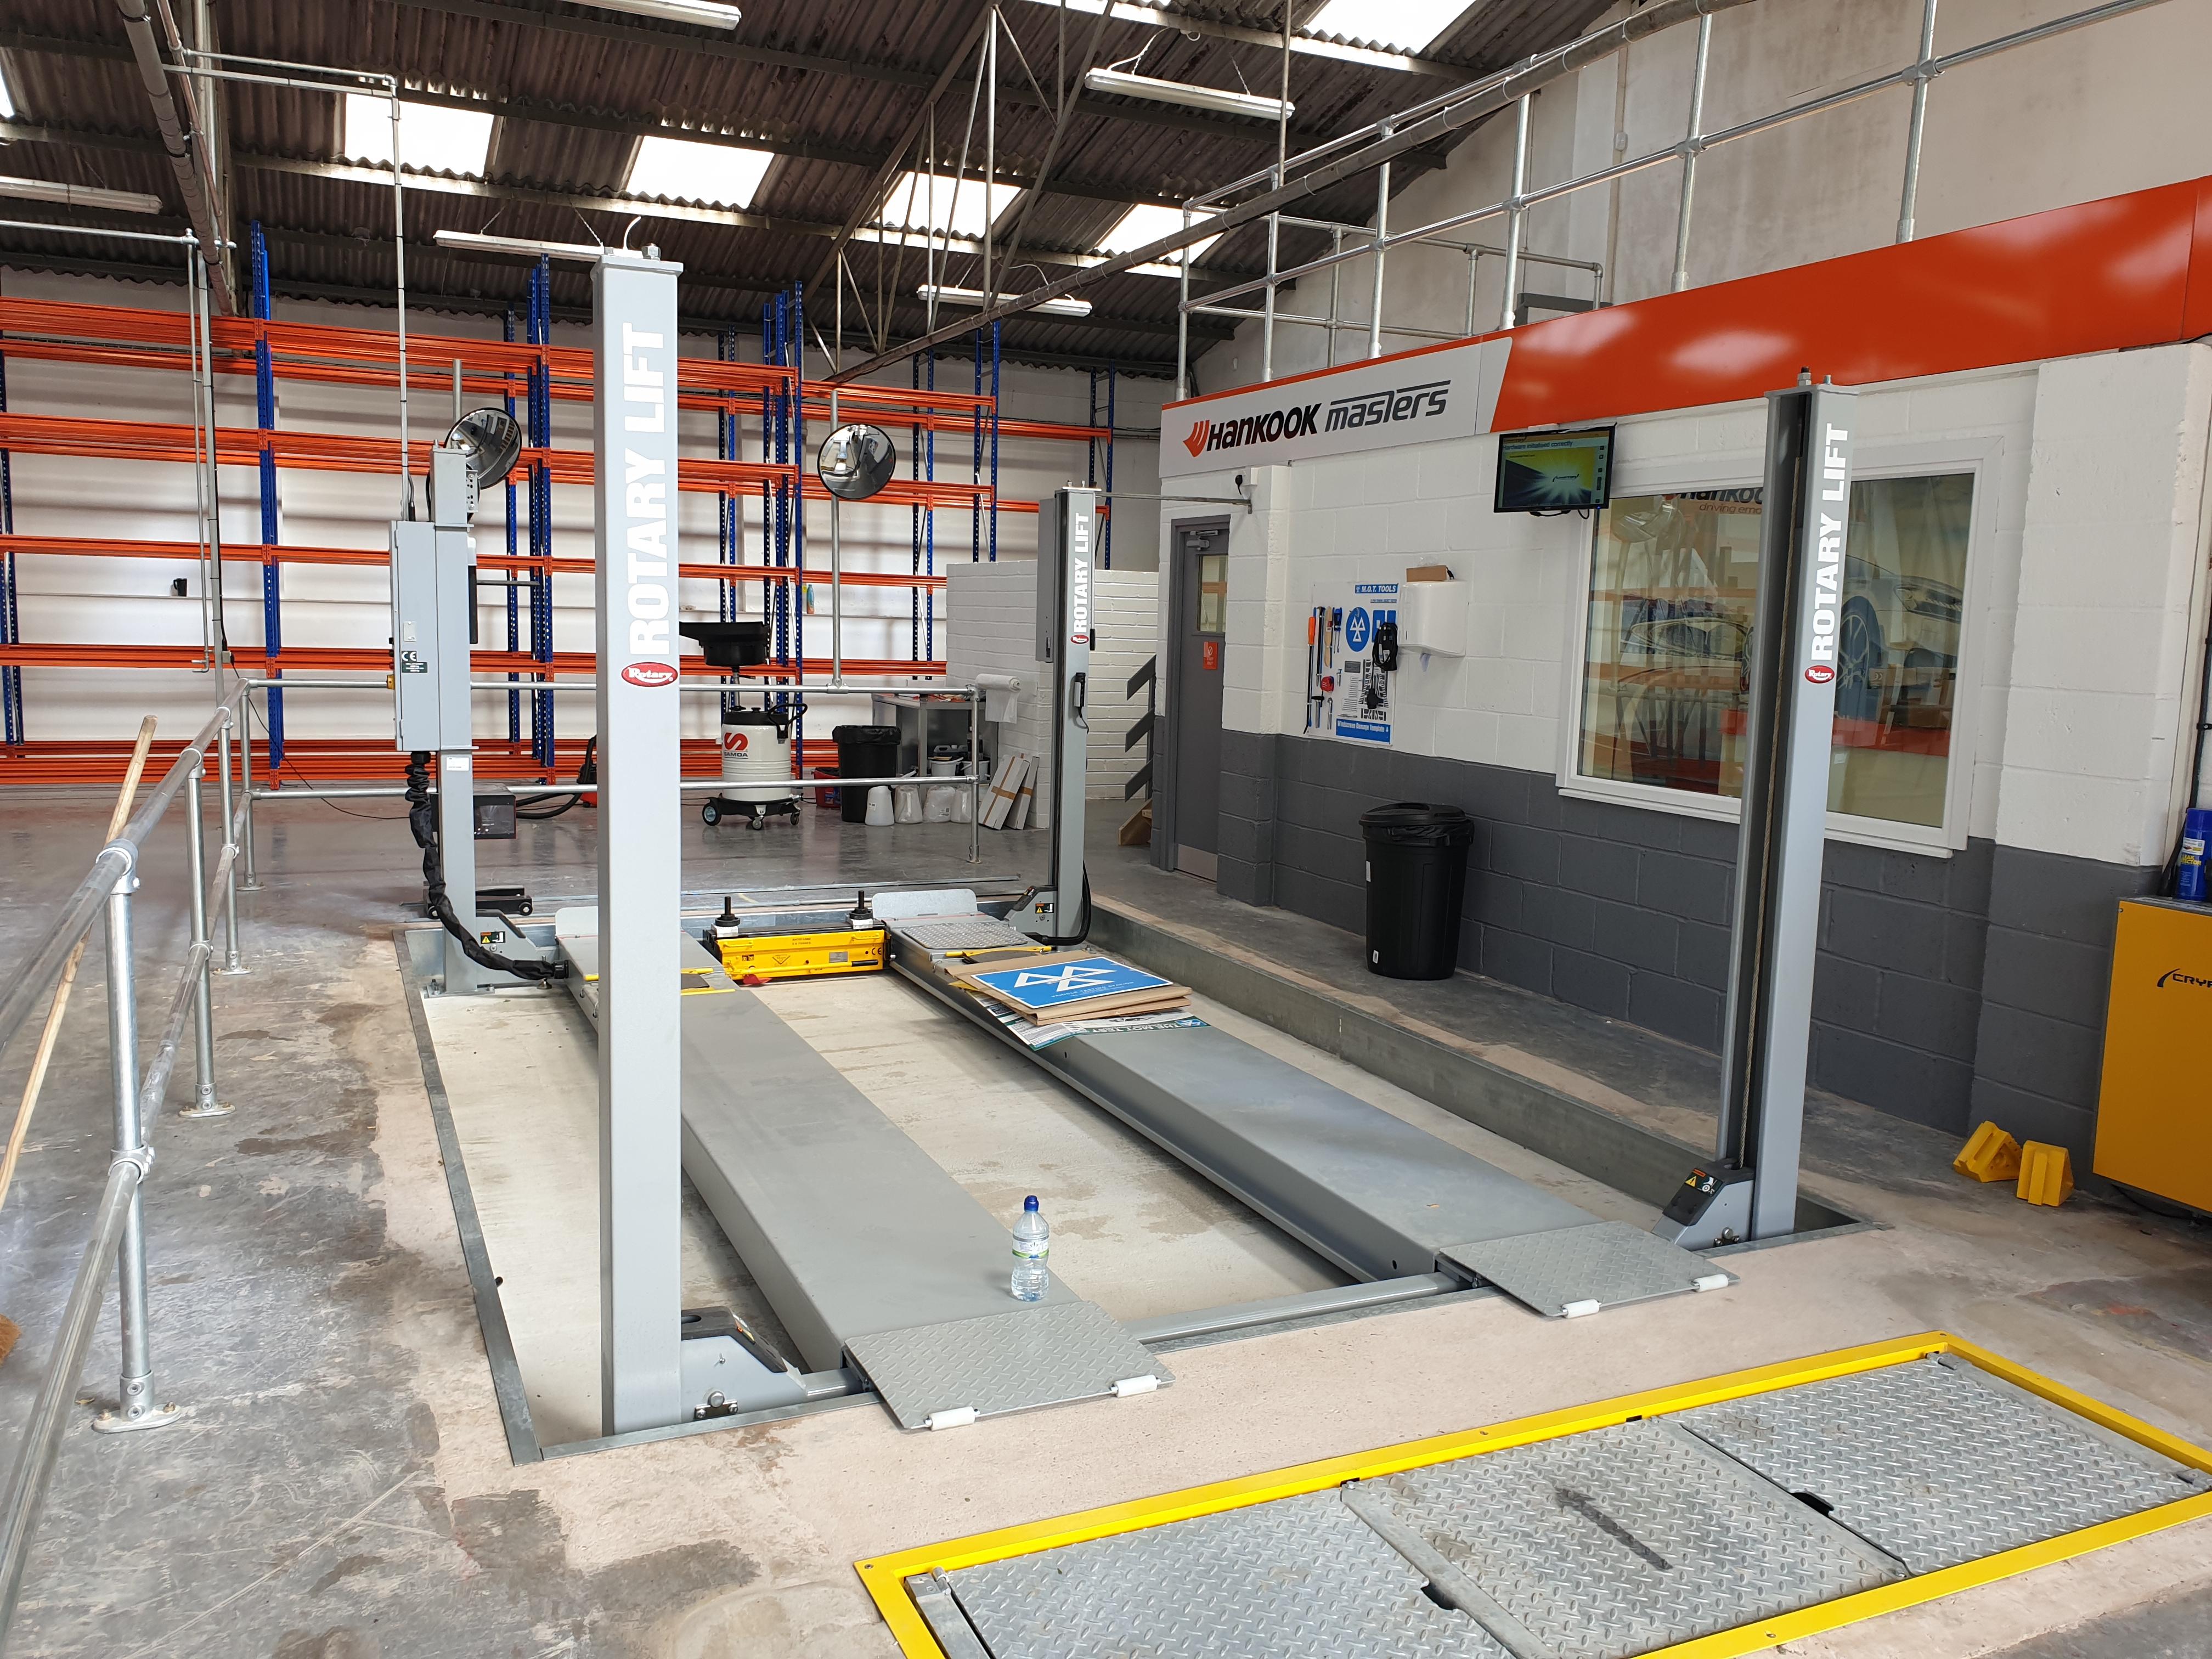 Brand new MoT bad installed by AMN garage assist's installation team at Mr Tyre Warwick